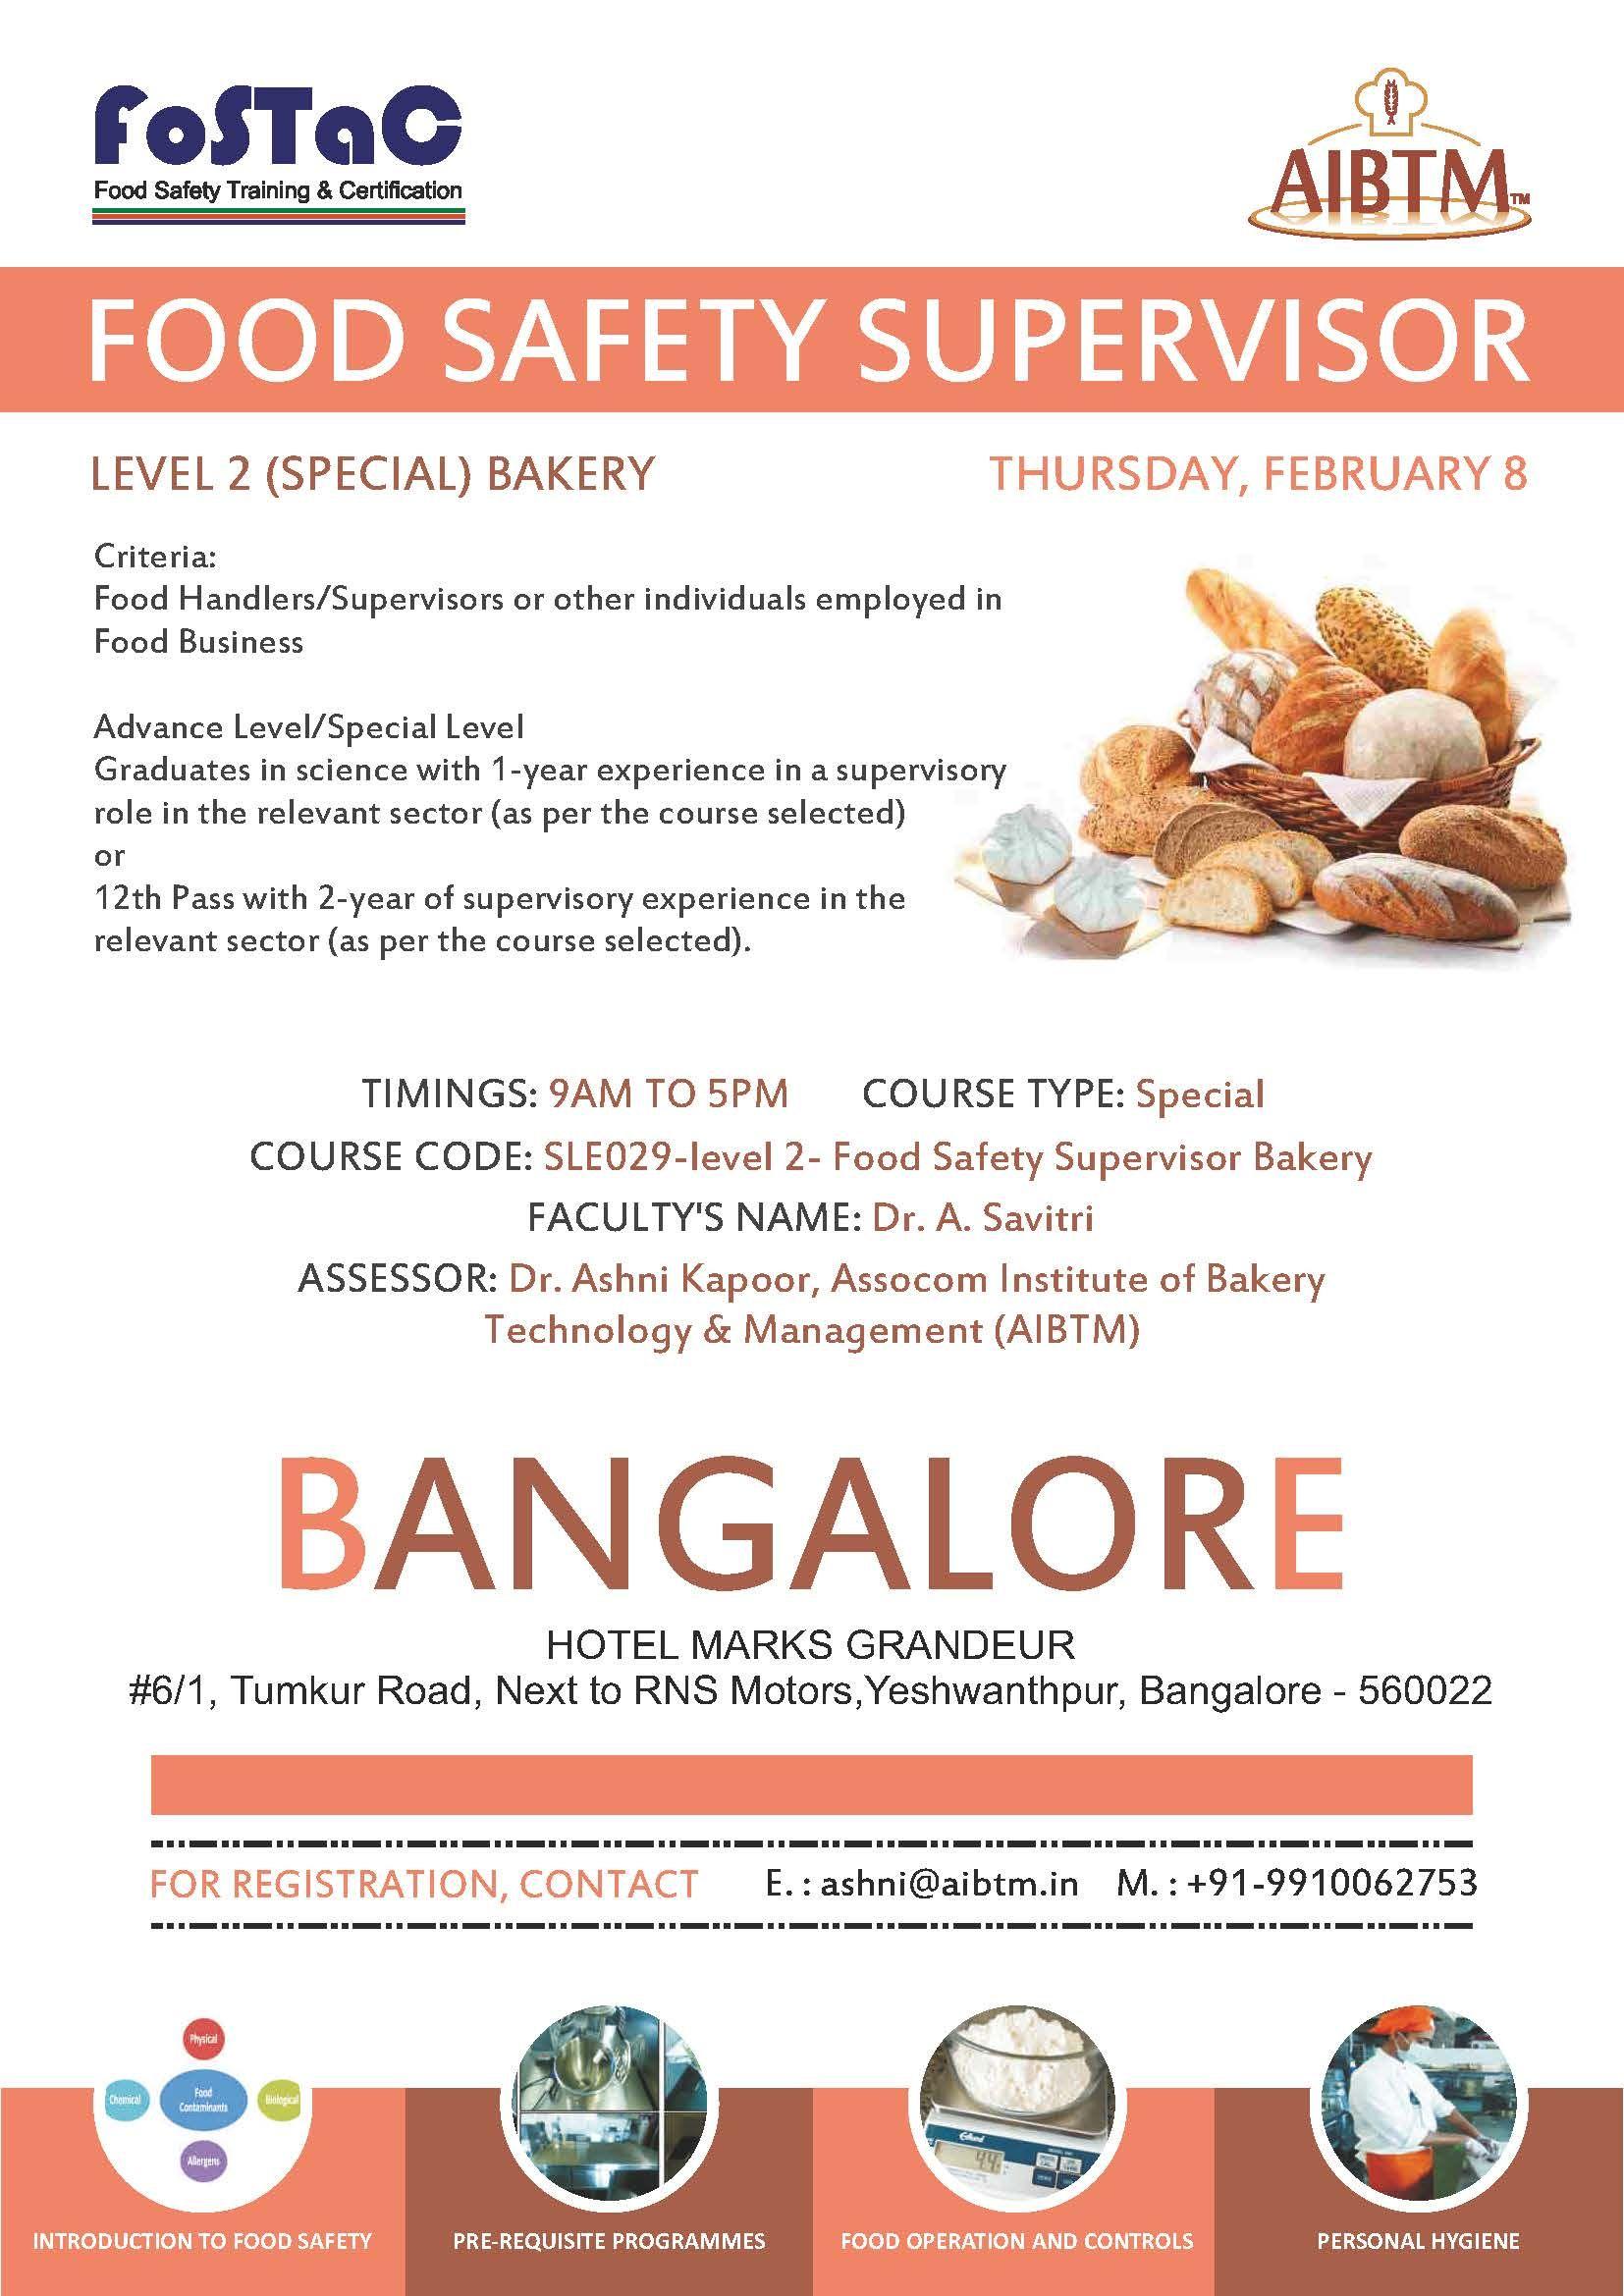 Enroll Food Safety Supervisor Training Program on Level 2